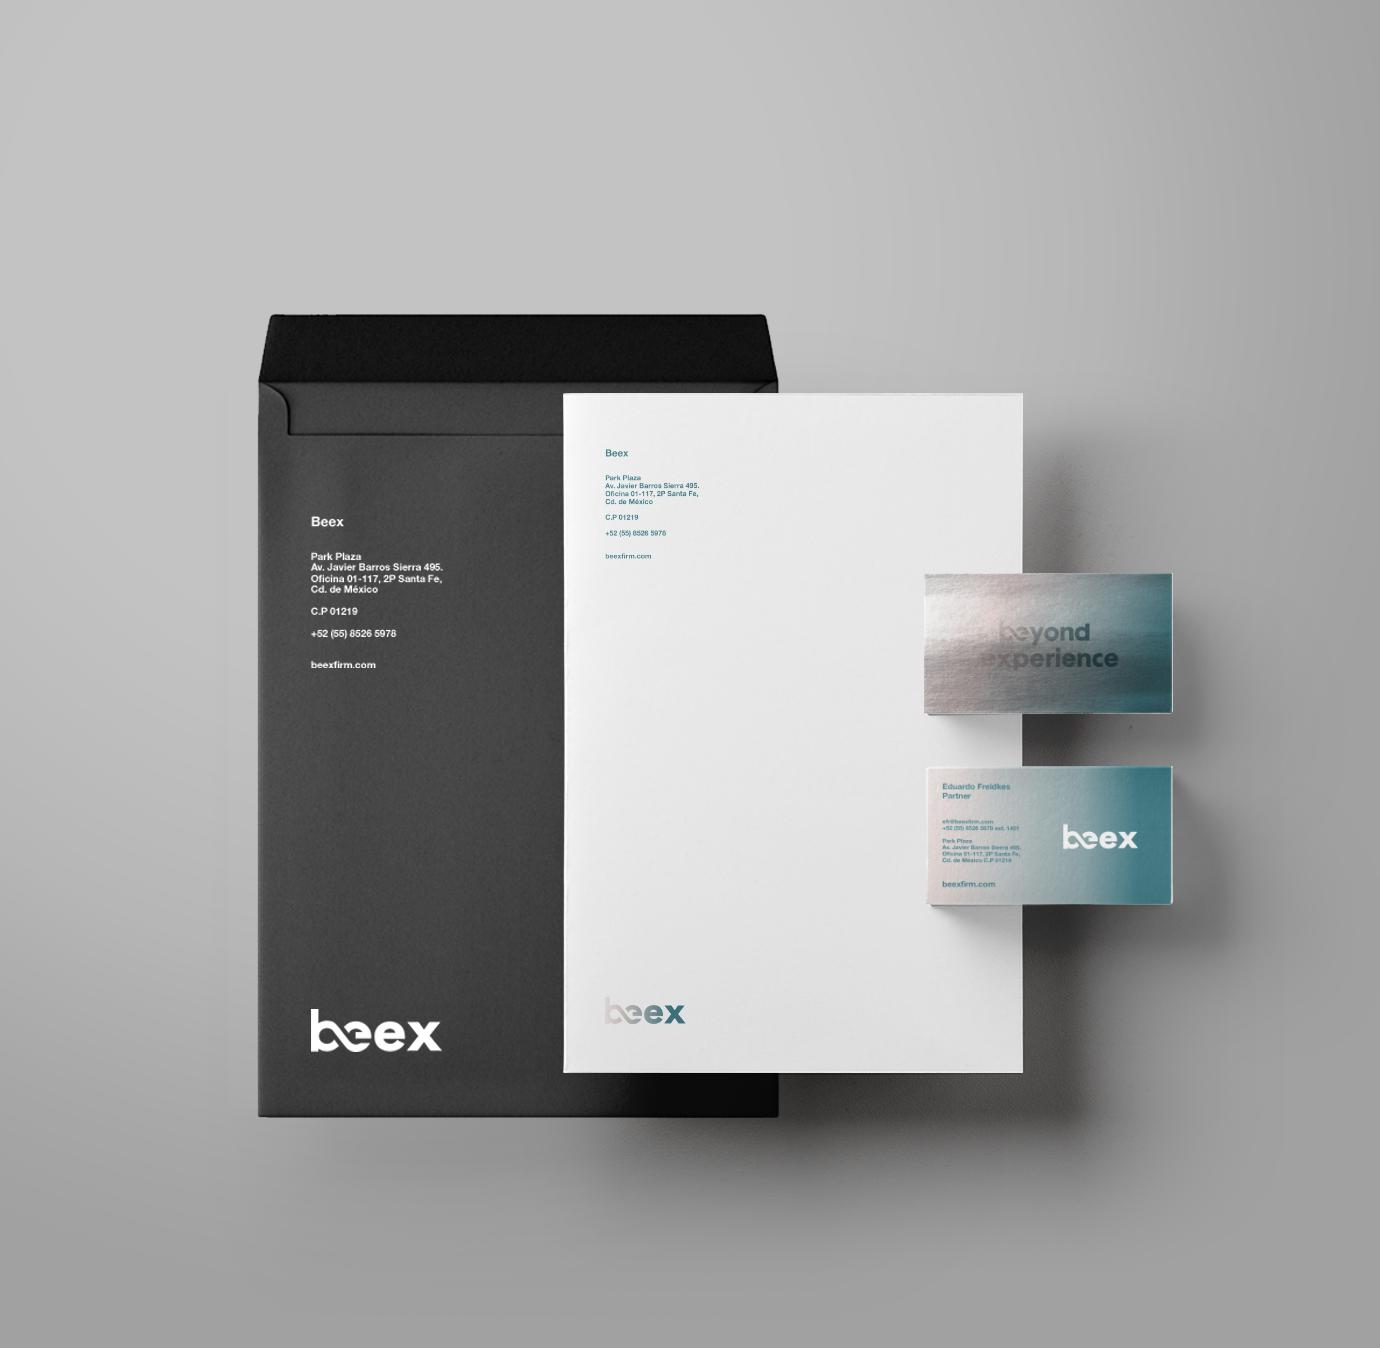 Envelope_Beex-yoenpaperland